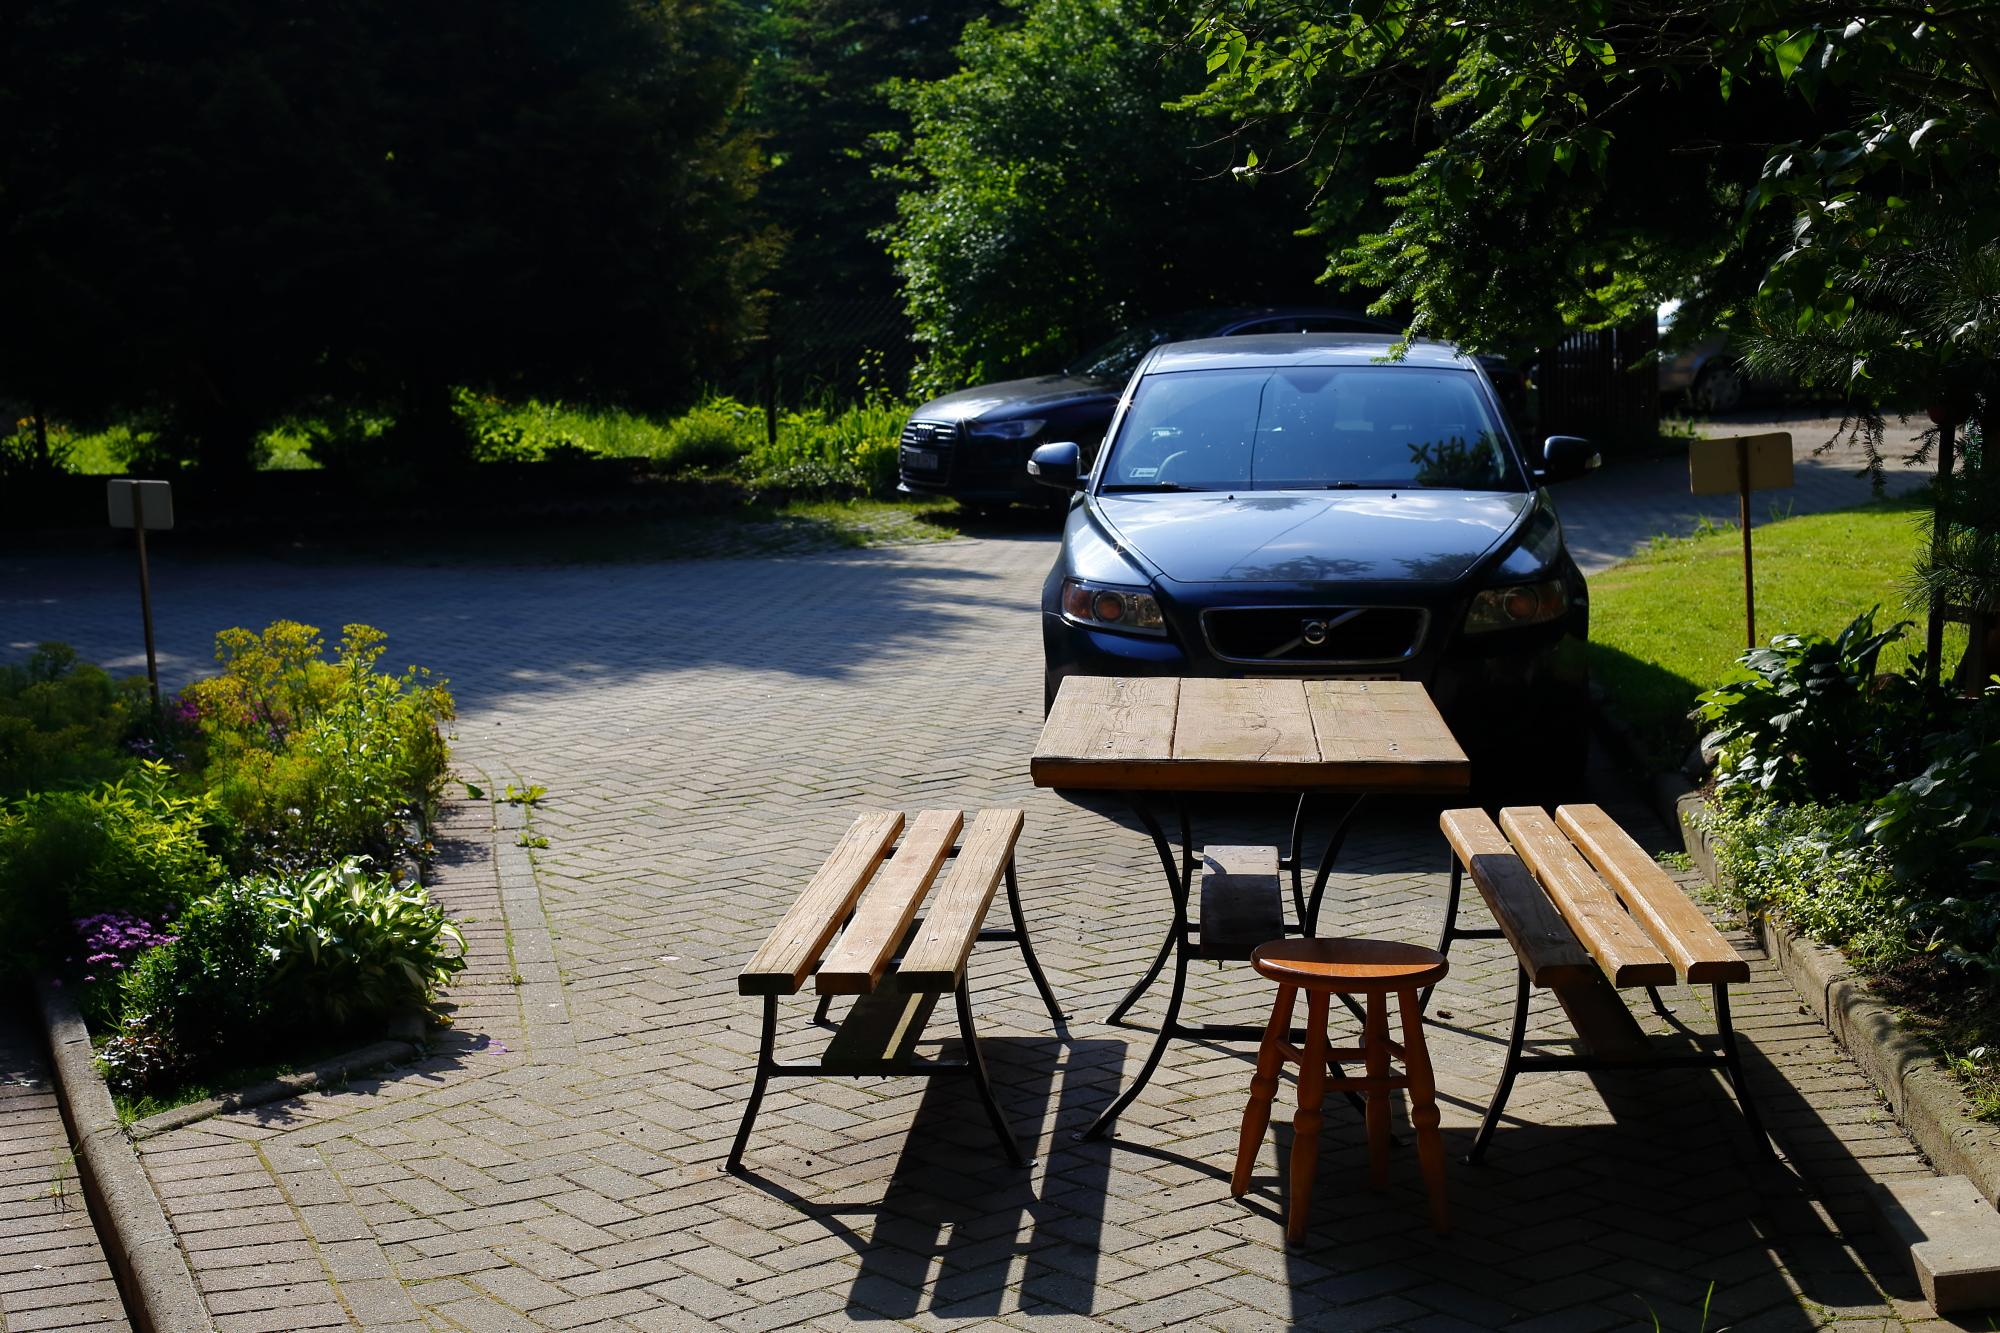 Moje Tatry - jedyny taki pensjonat pod Tatrami